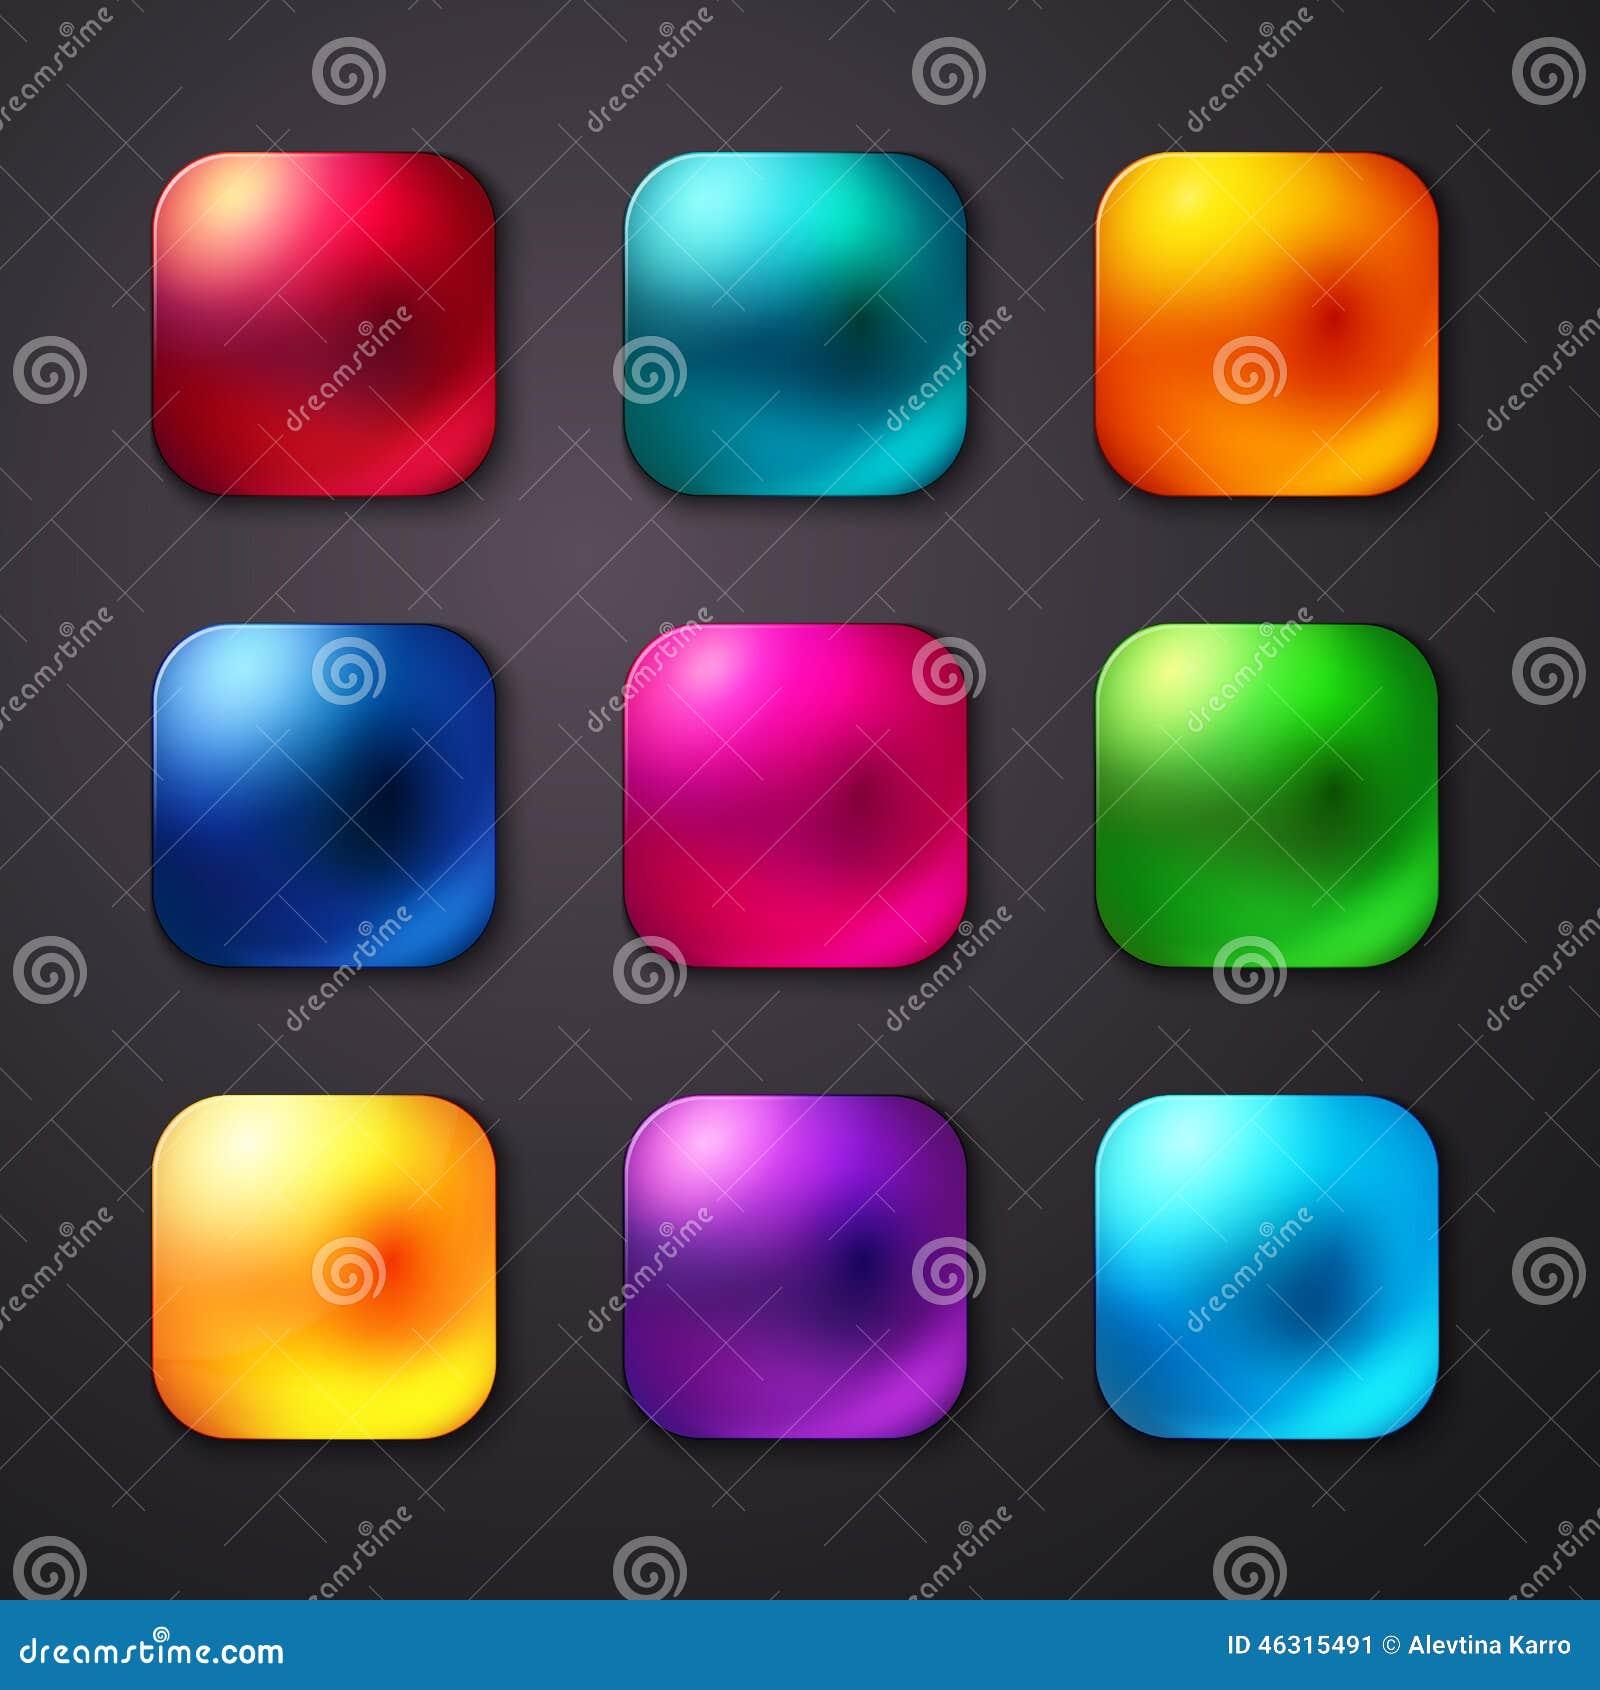 Kn Mobil App